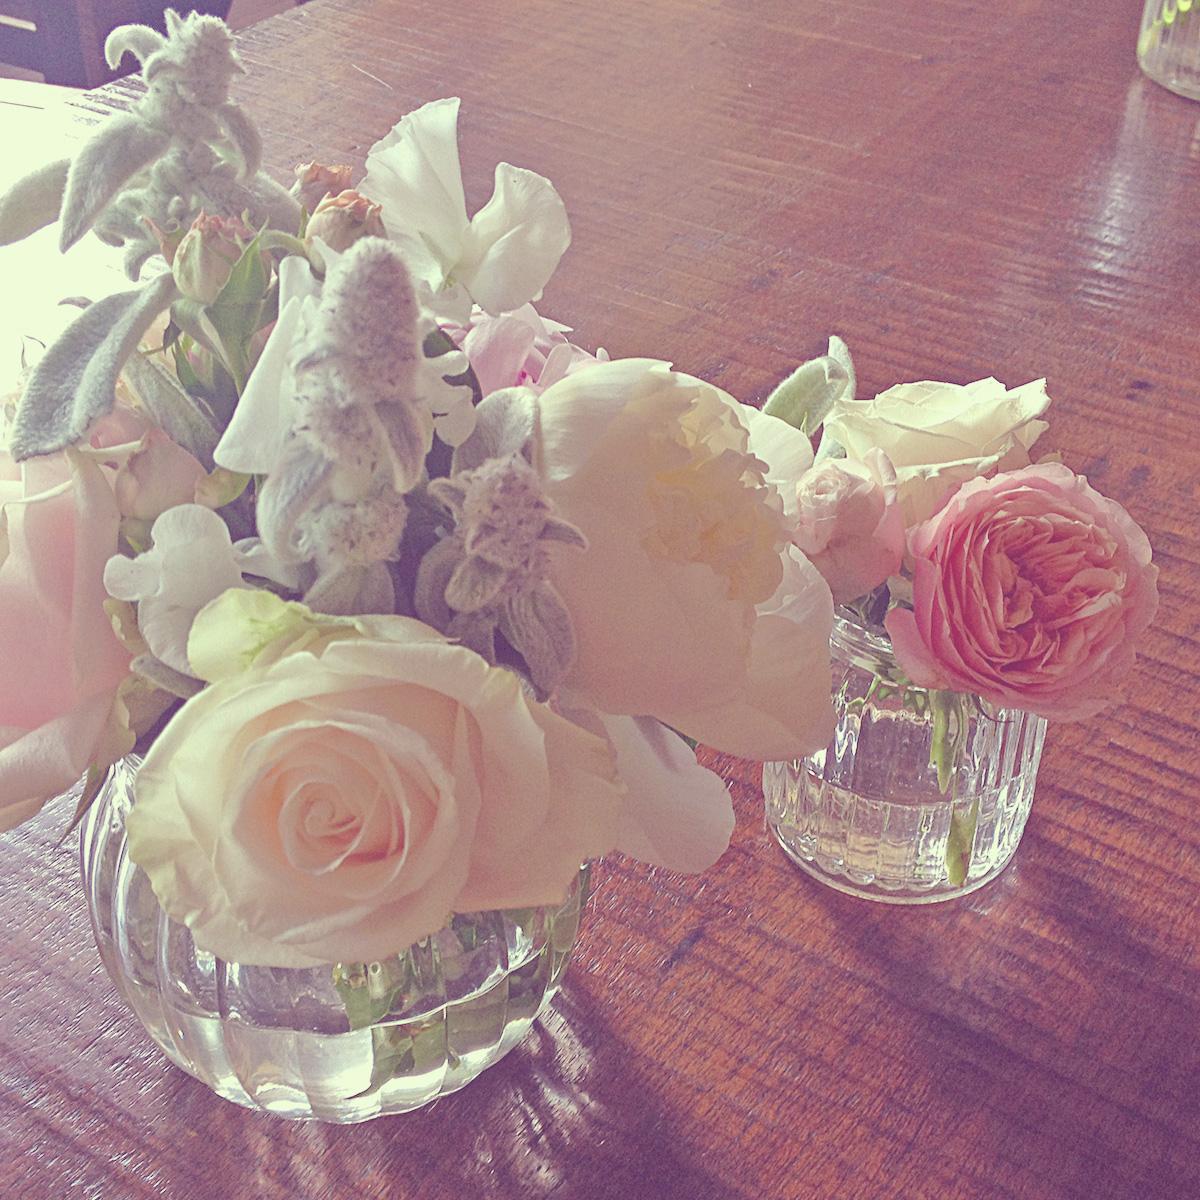 01-wedding-centerpieces-juliet-rose